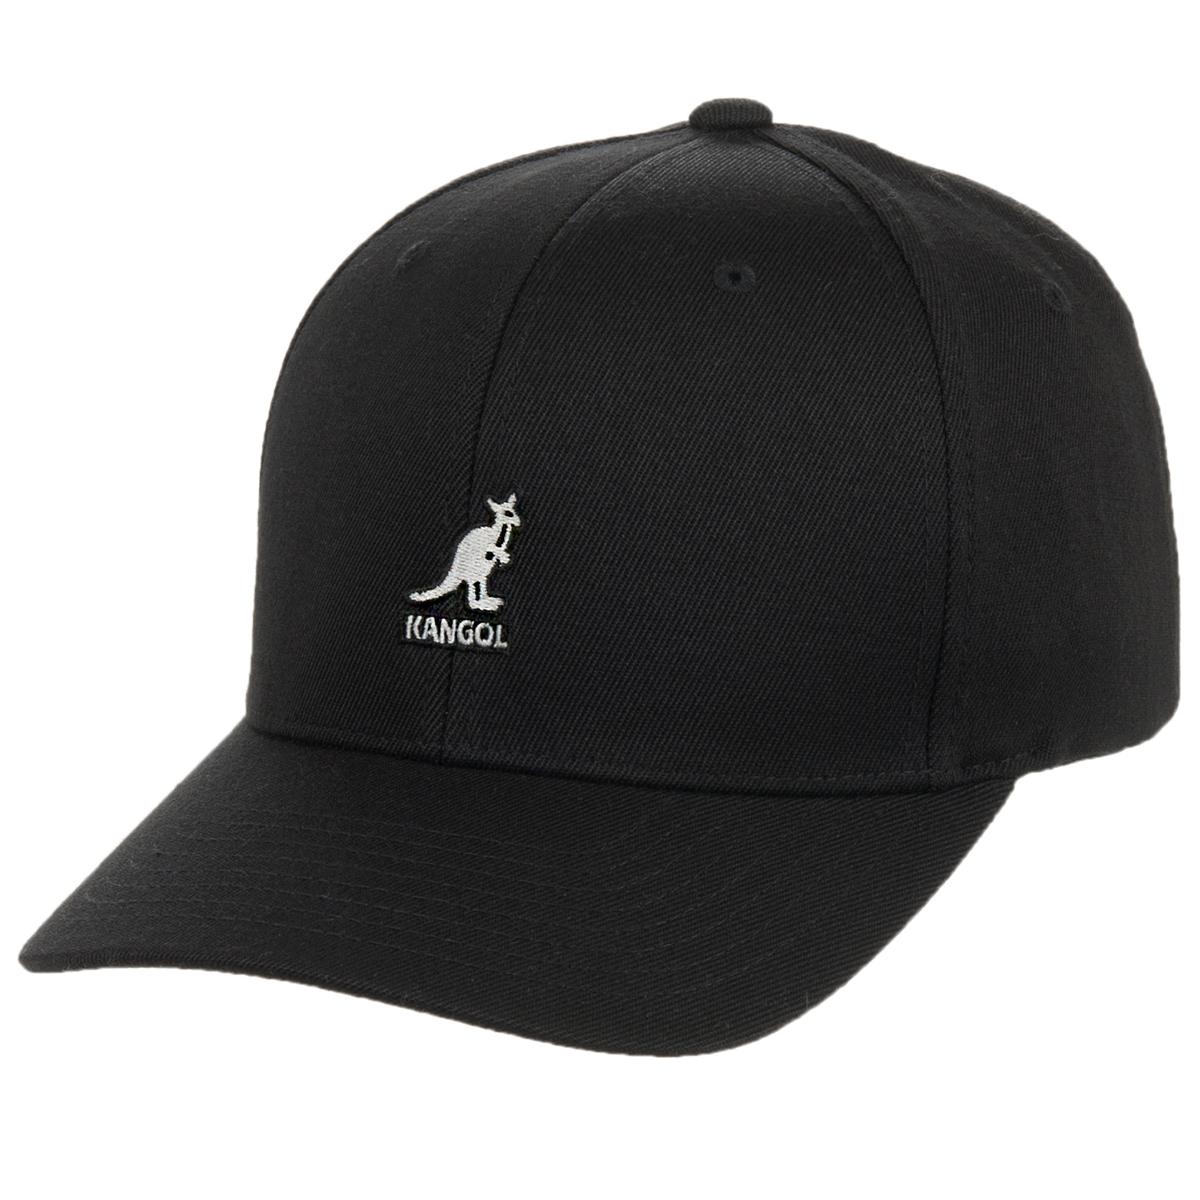 Kangol berretto con visiera Wool Flex Fit ... 000a9c1c93cd